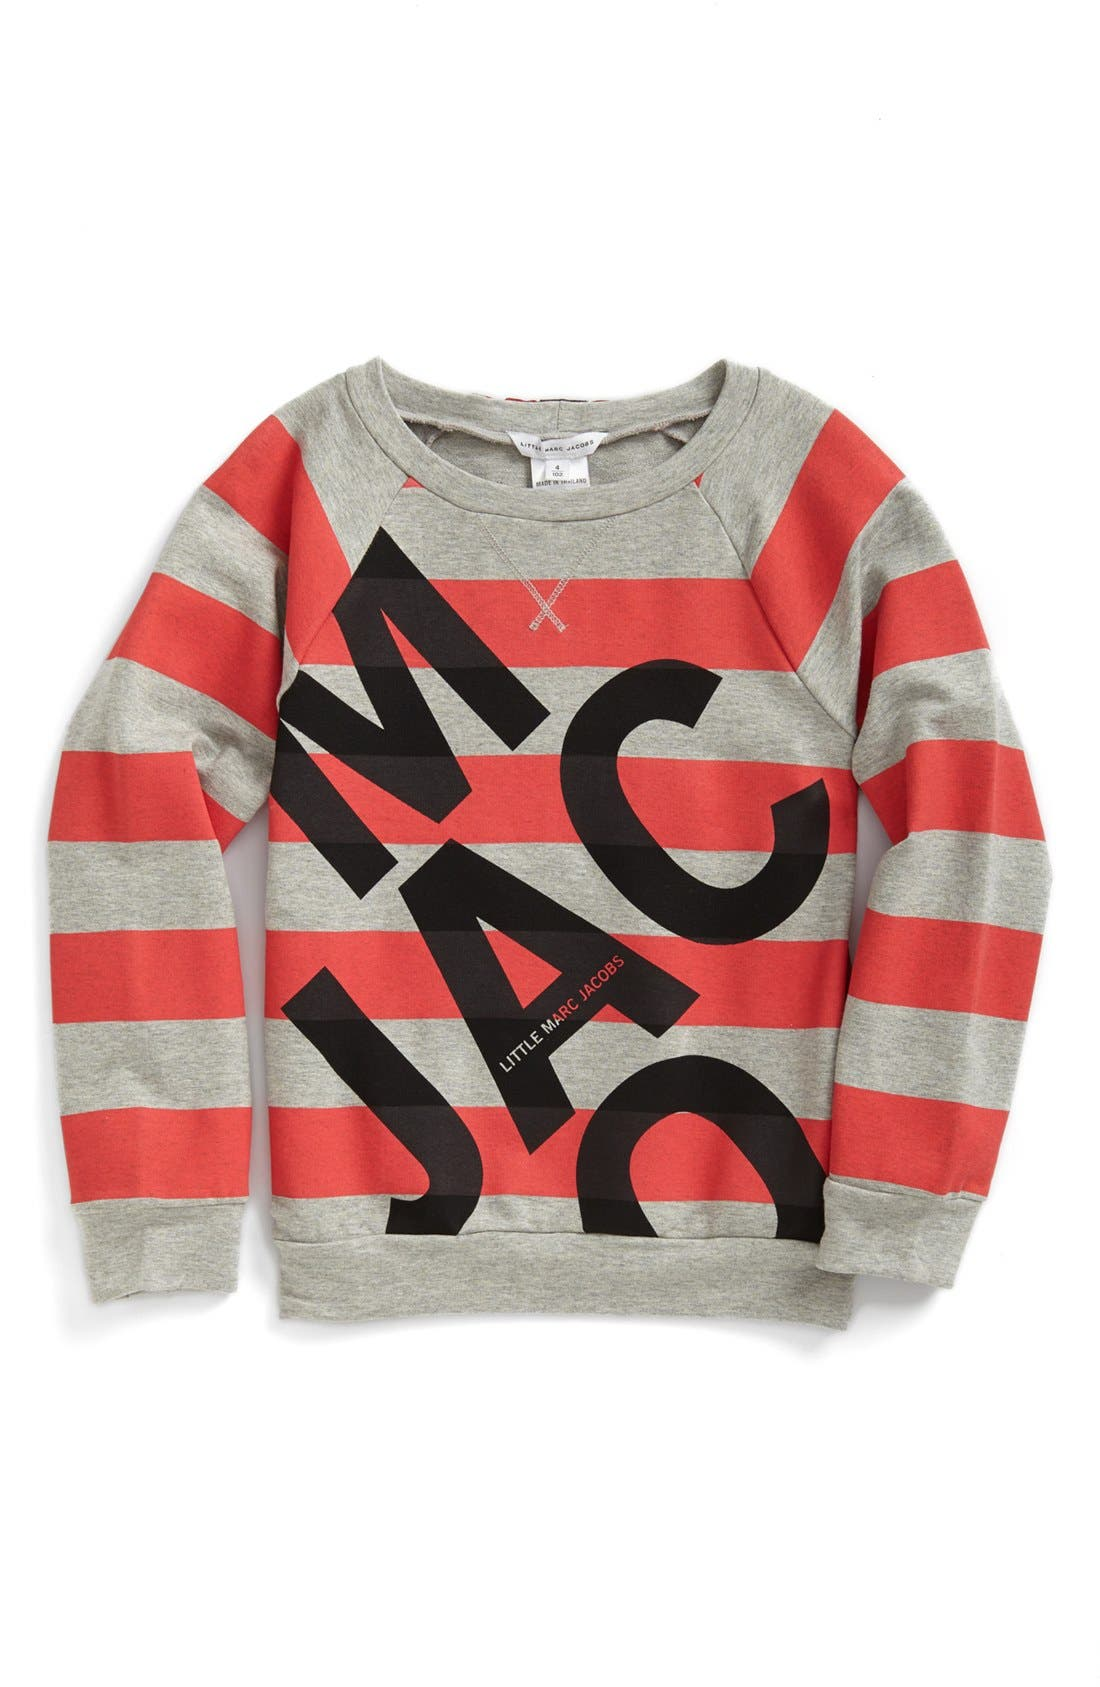 Main Image - LITTLE MARC JACOBS 'Block Letter' Sweatshirt (Toddler Girls)